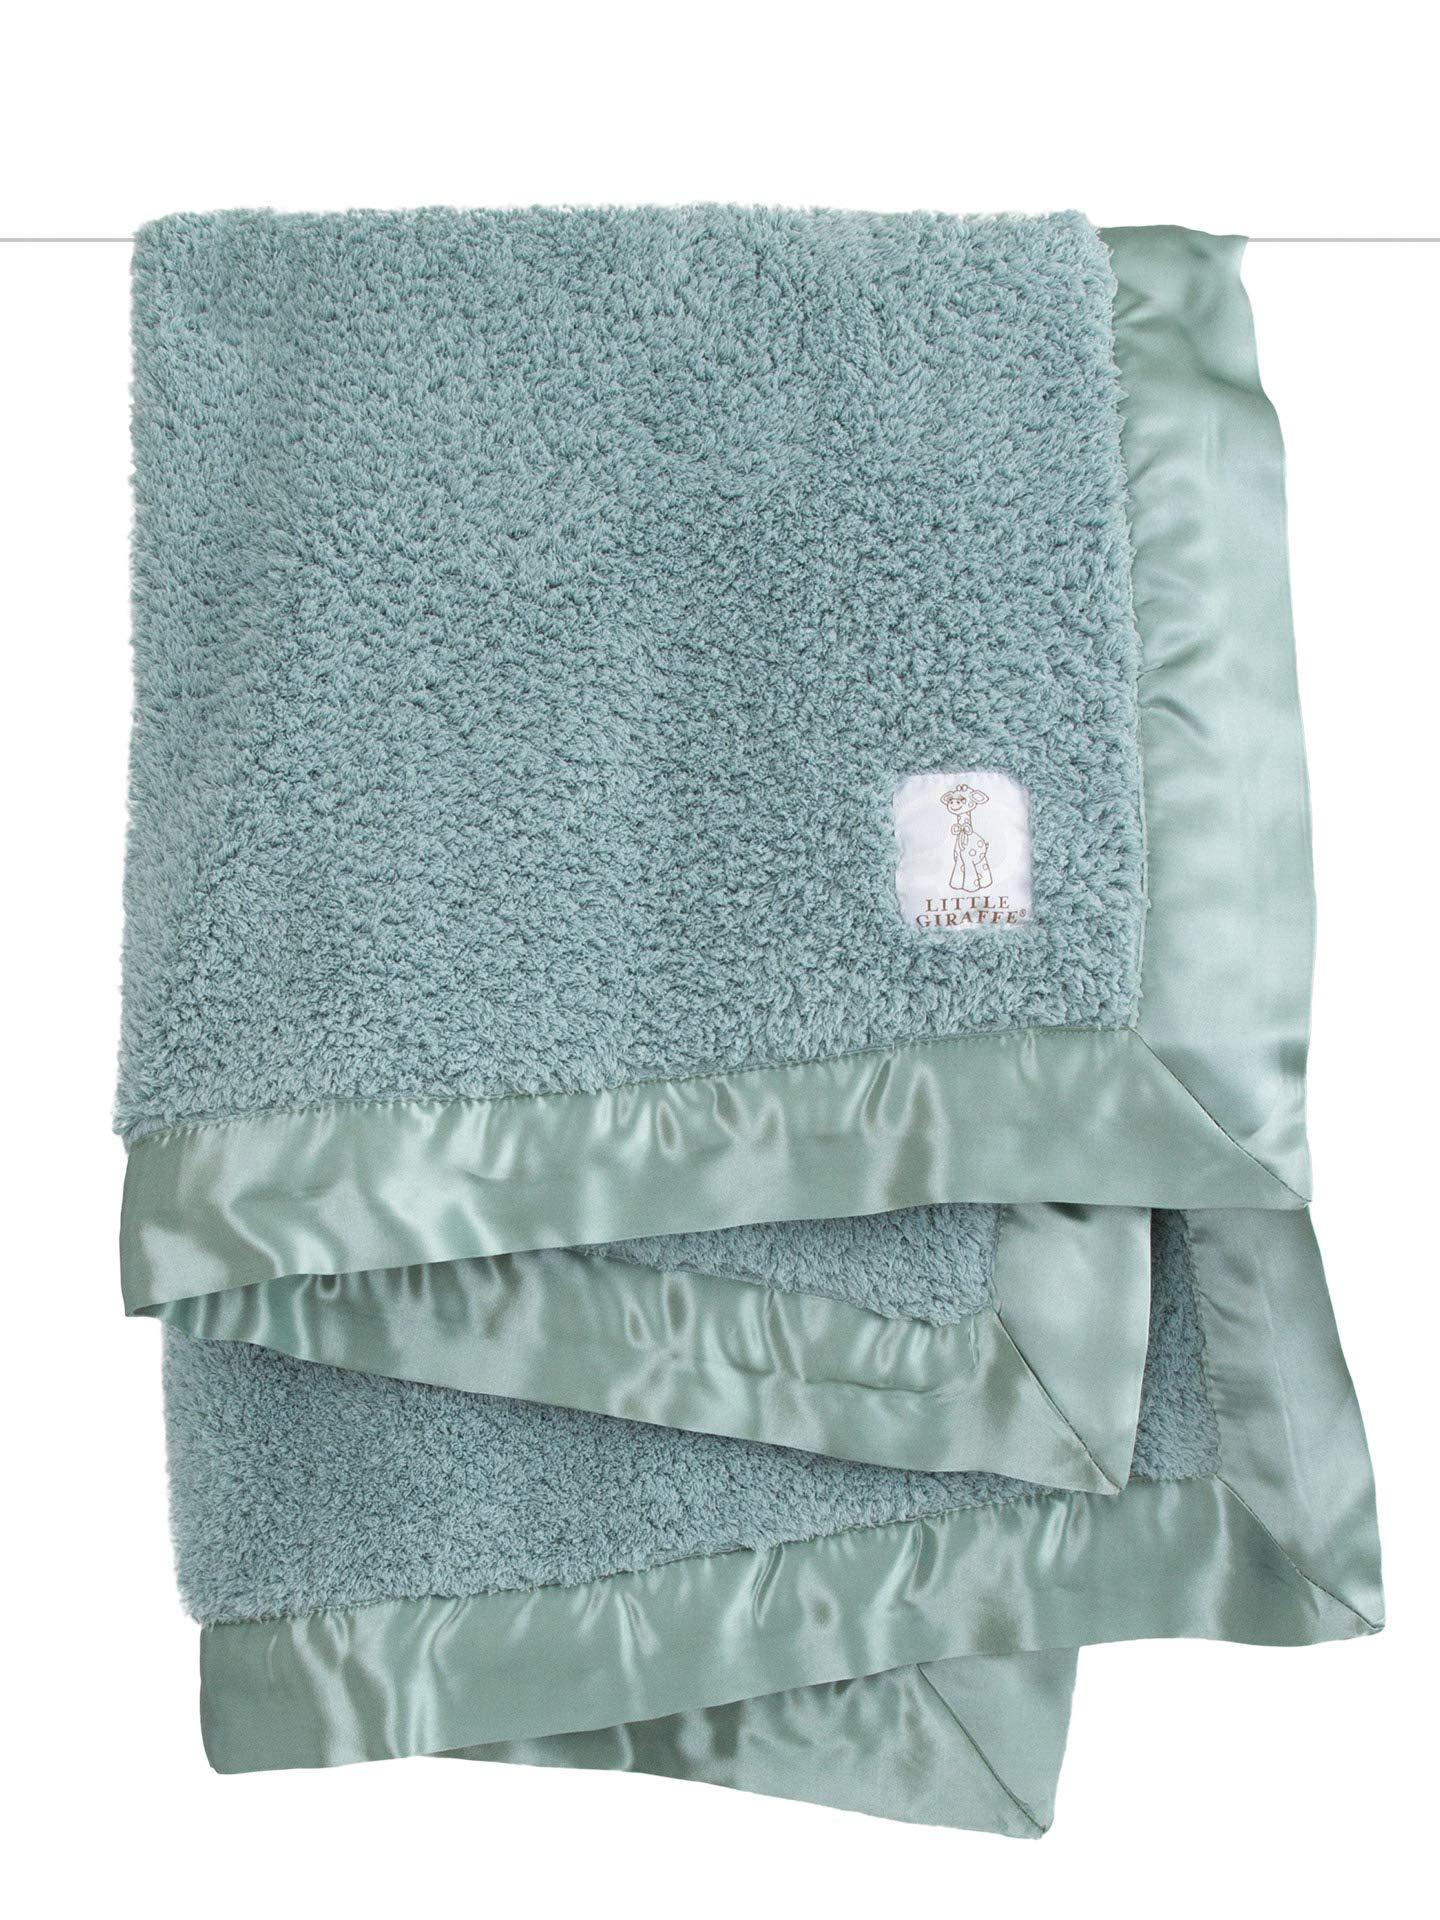 Little Giraffe Chenille Stroller Baby Blanket, Sage, 29 Inch x 35 Inch by Little Giraffe